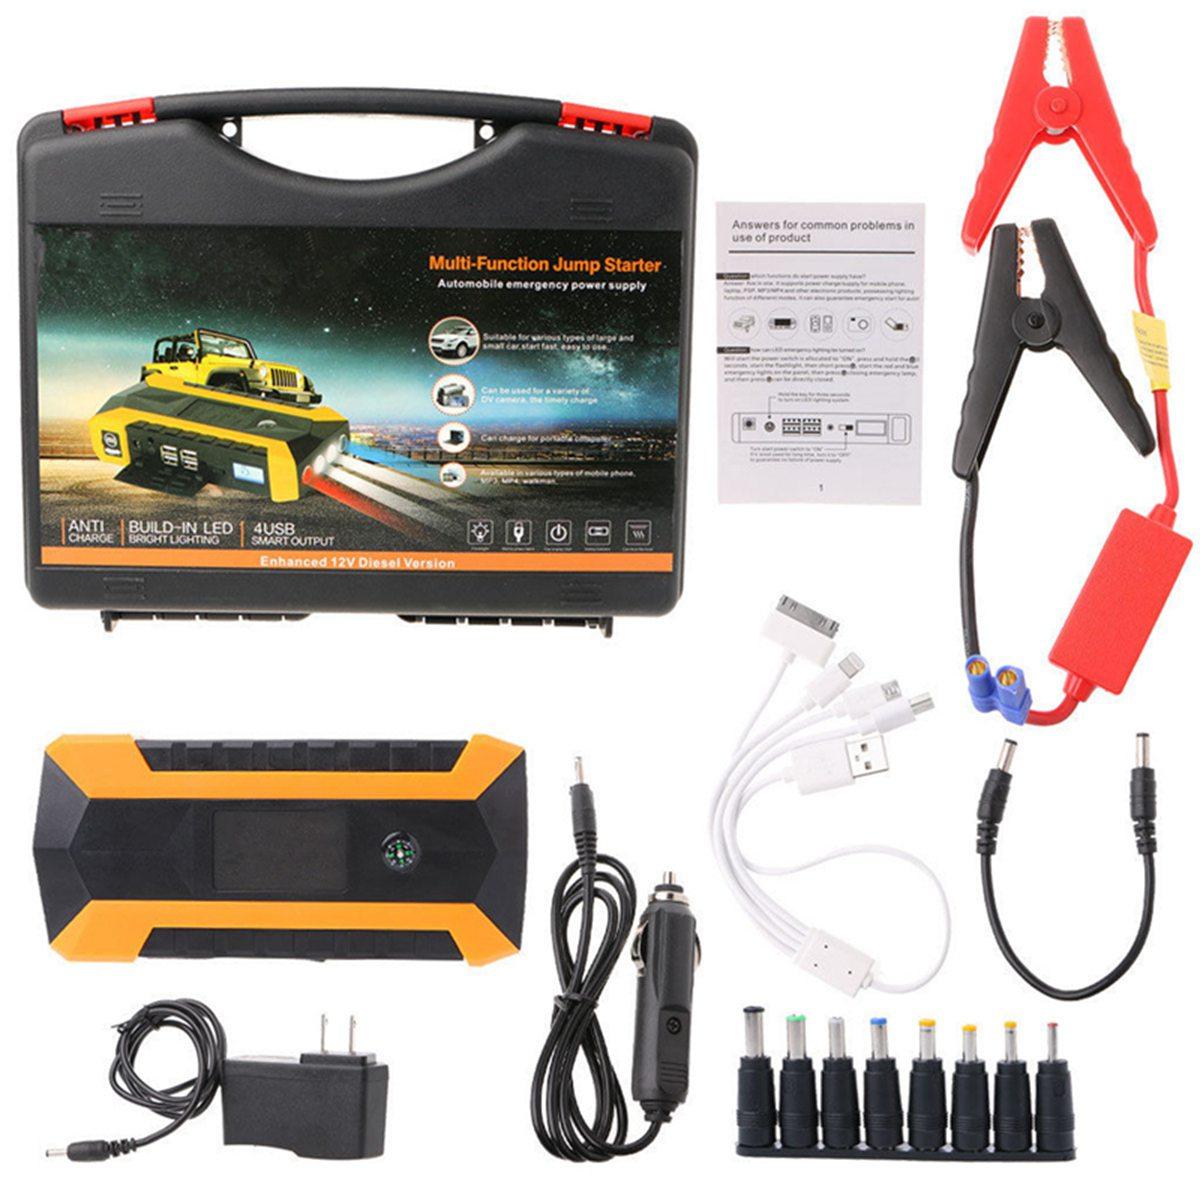 1set 89800mAh 12V 4USB Car font b Battery b font Charger Starting Car Jump Starter Booster